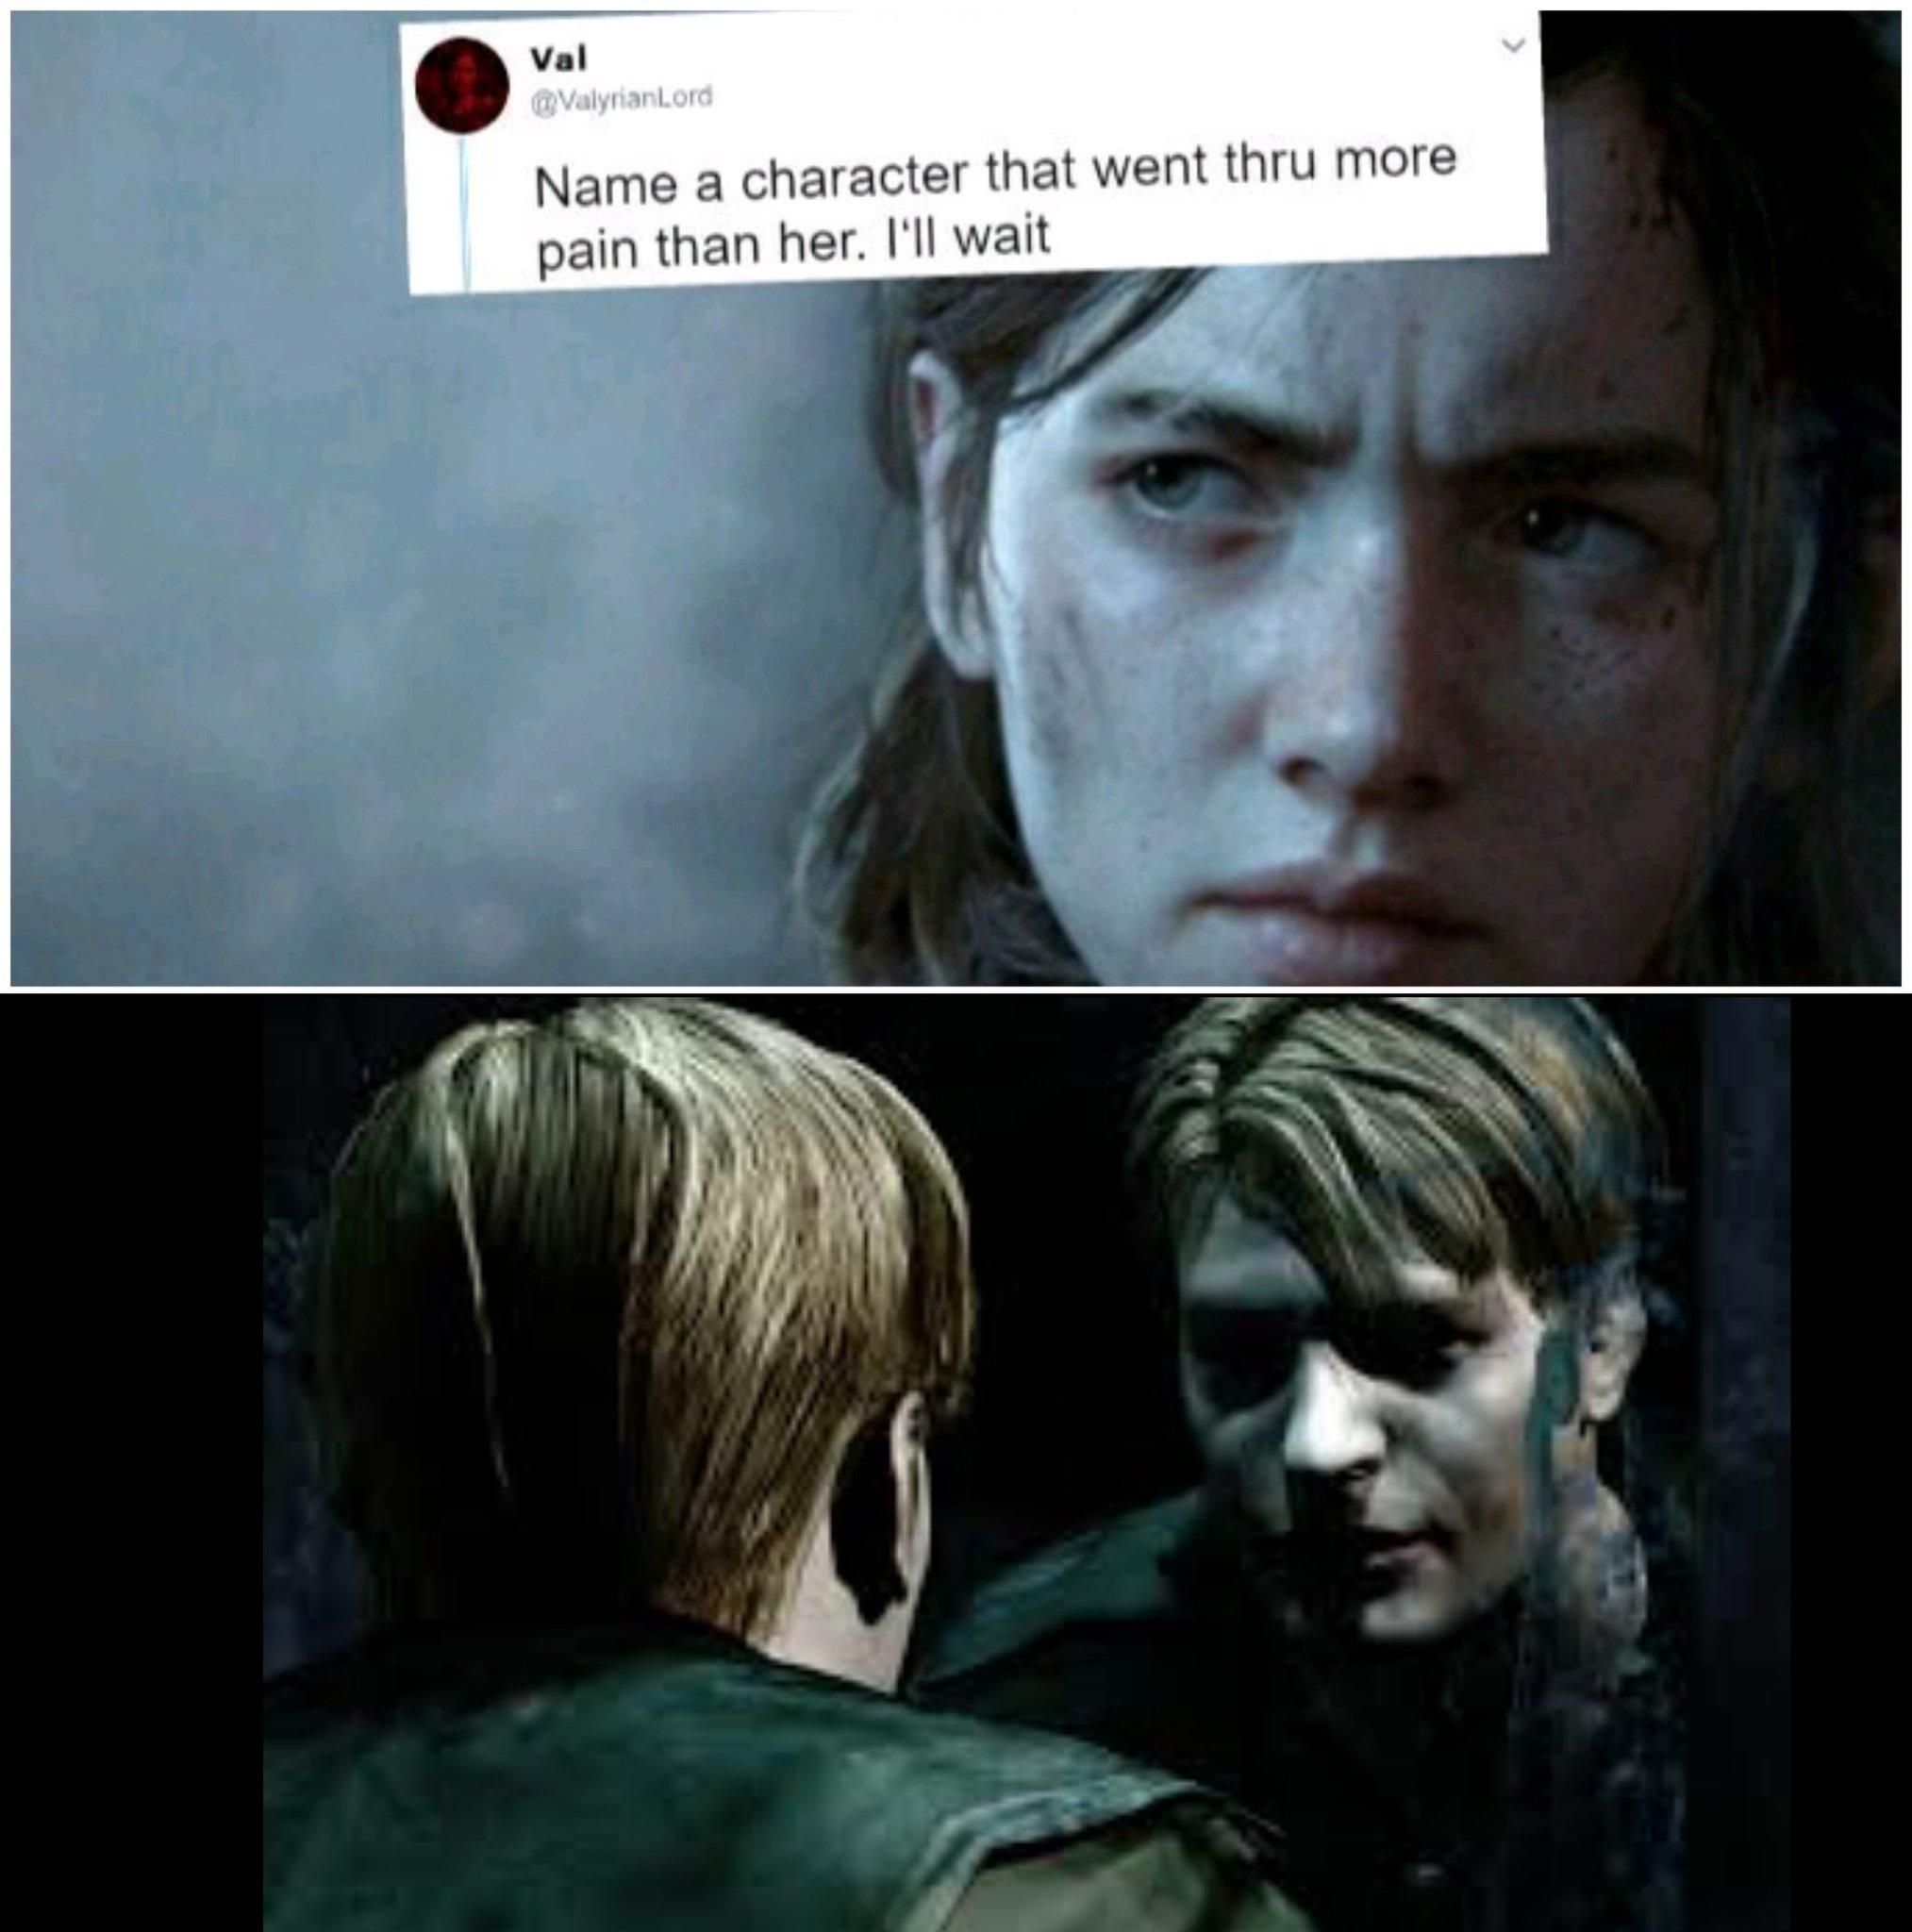 El que jugó Silent hill 2 lo conoce - meme